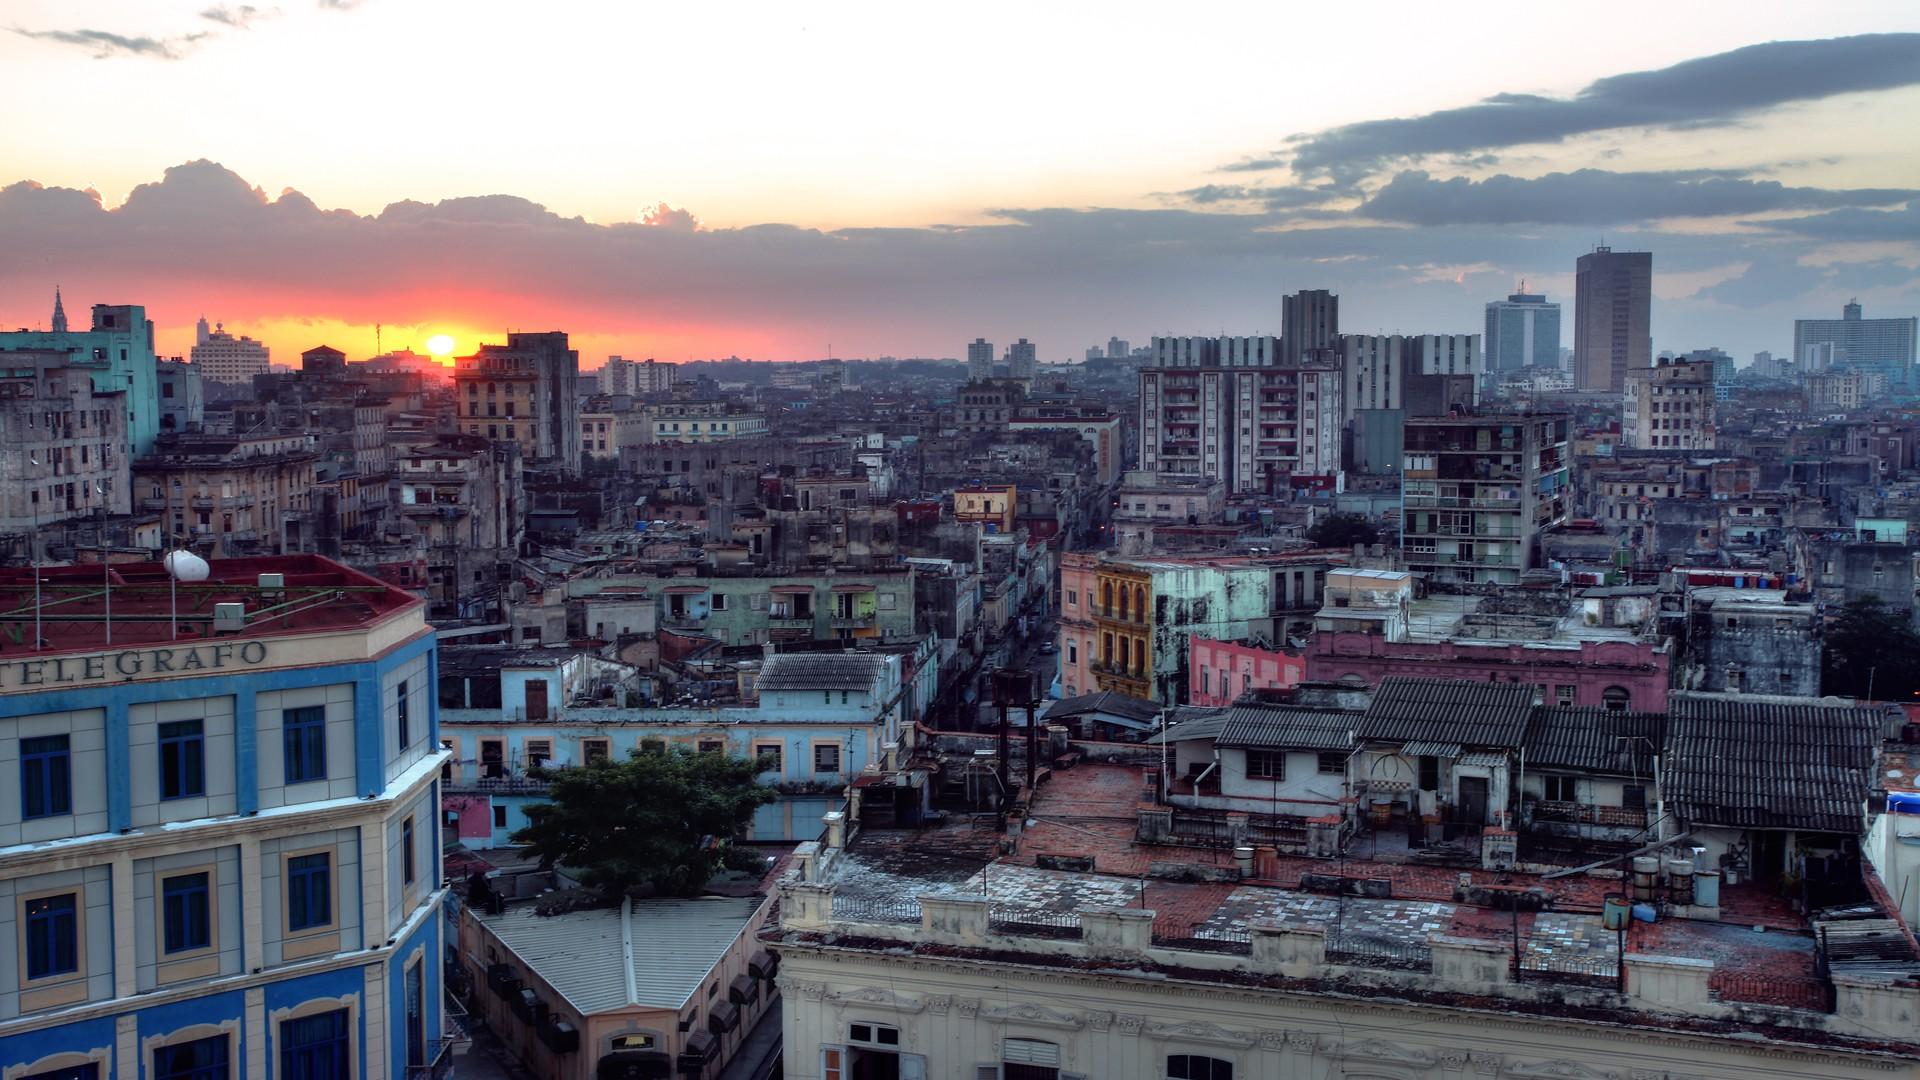 General 1920x1080 city Havana rooftops sunset cityscape